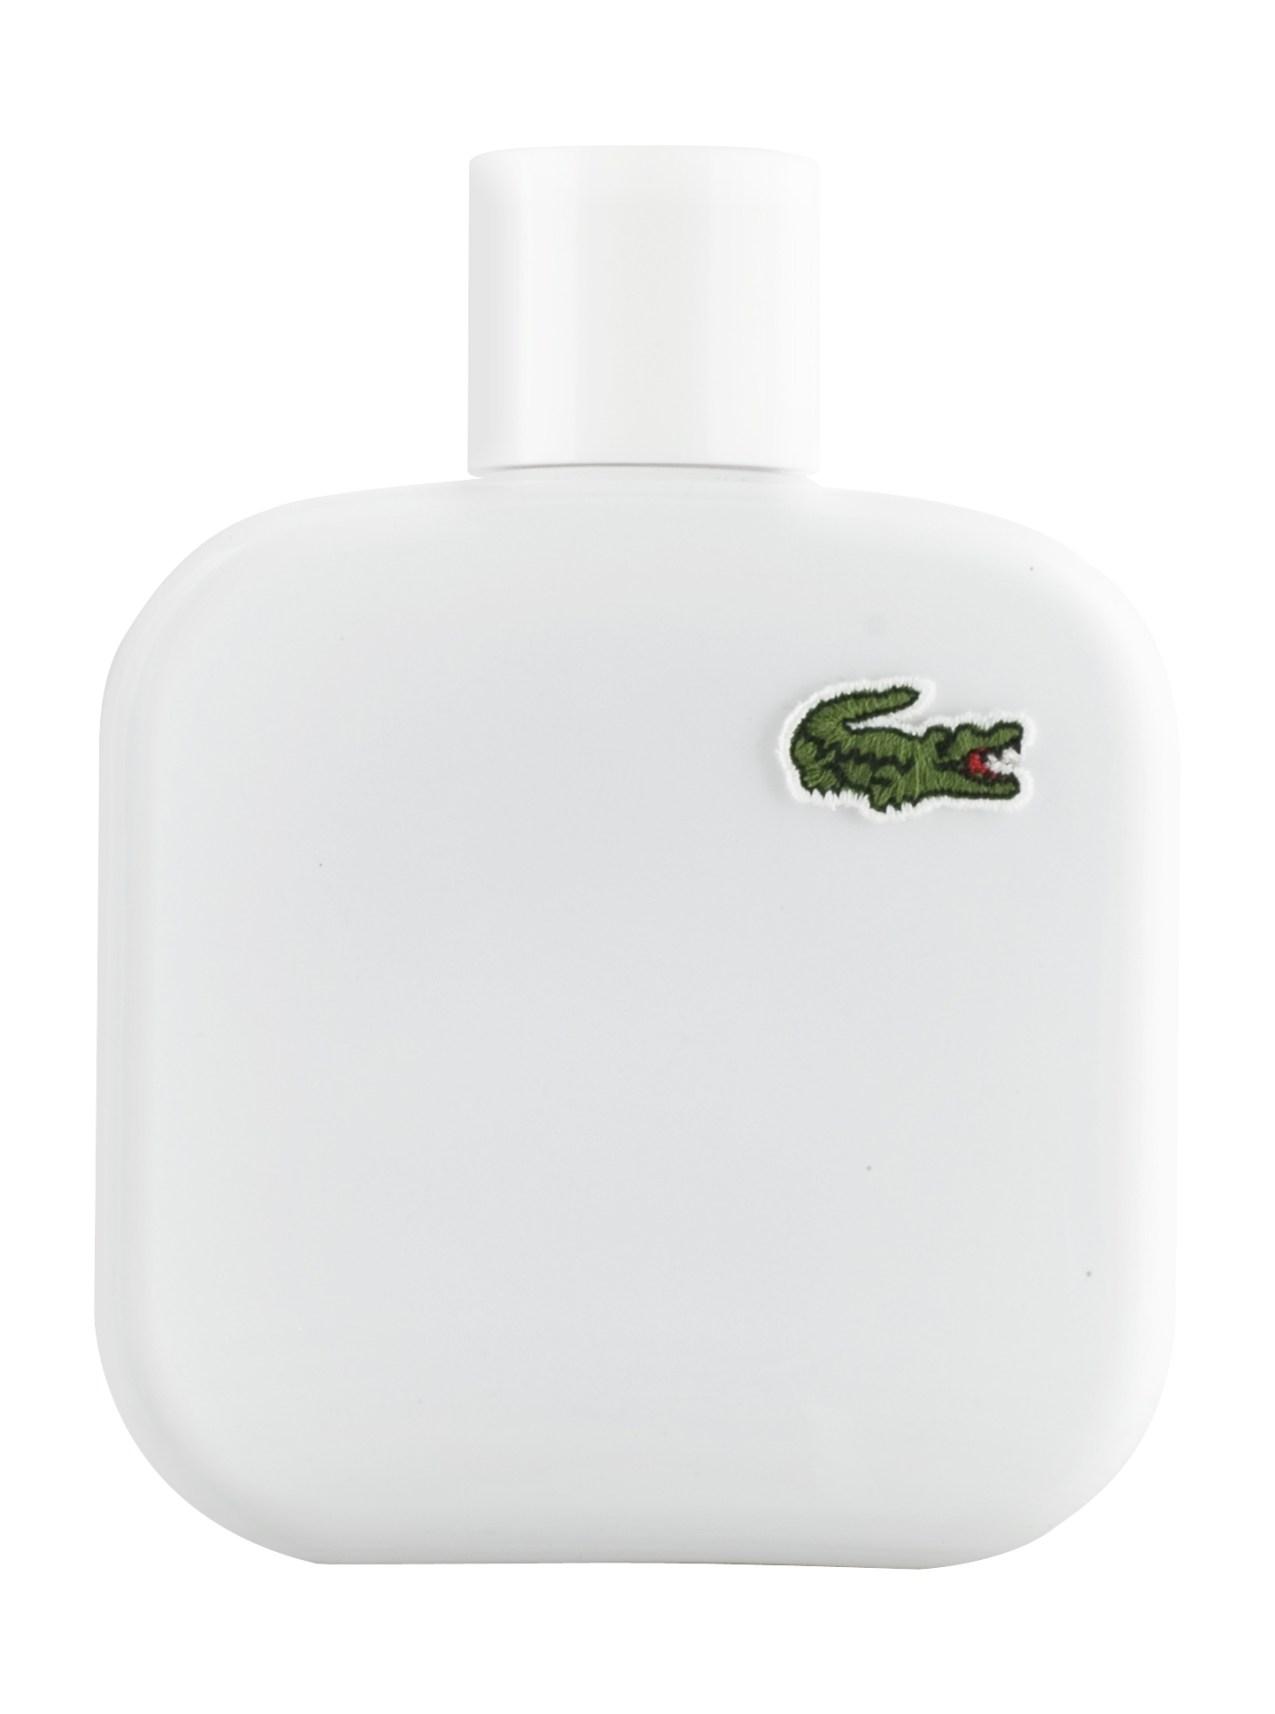 Eau De Lacoste Blanc is just £28.99 for members of The Perfume Shop Rewards Club